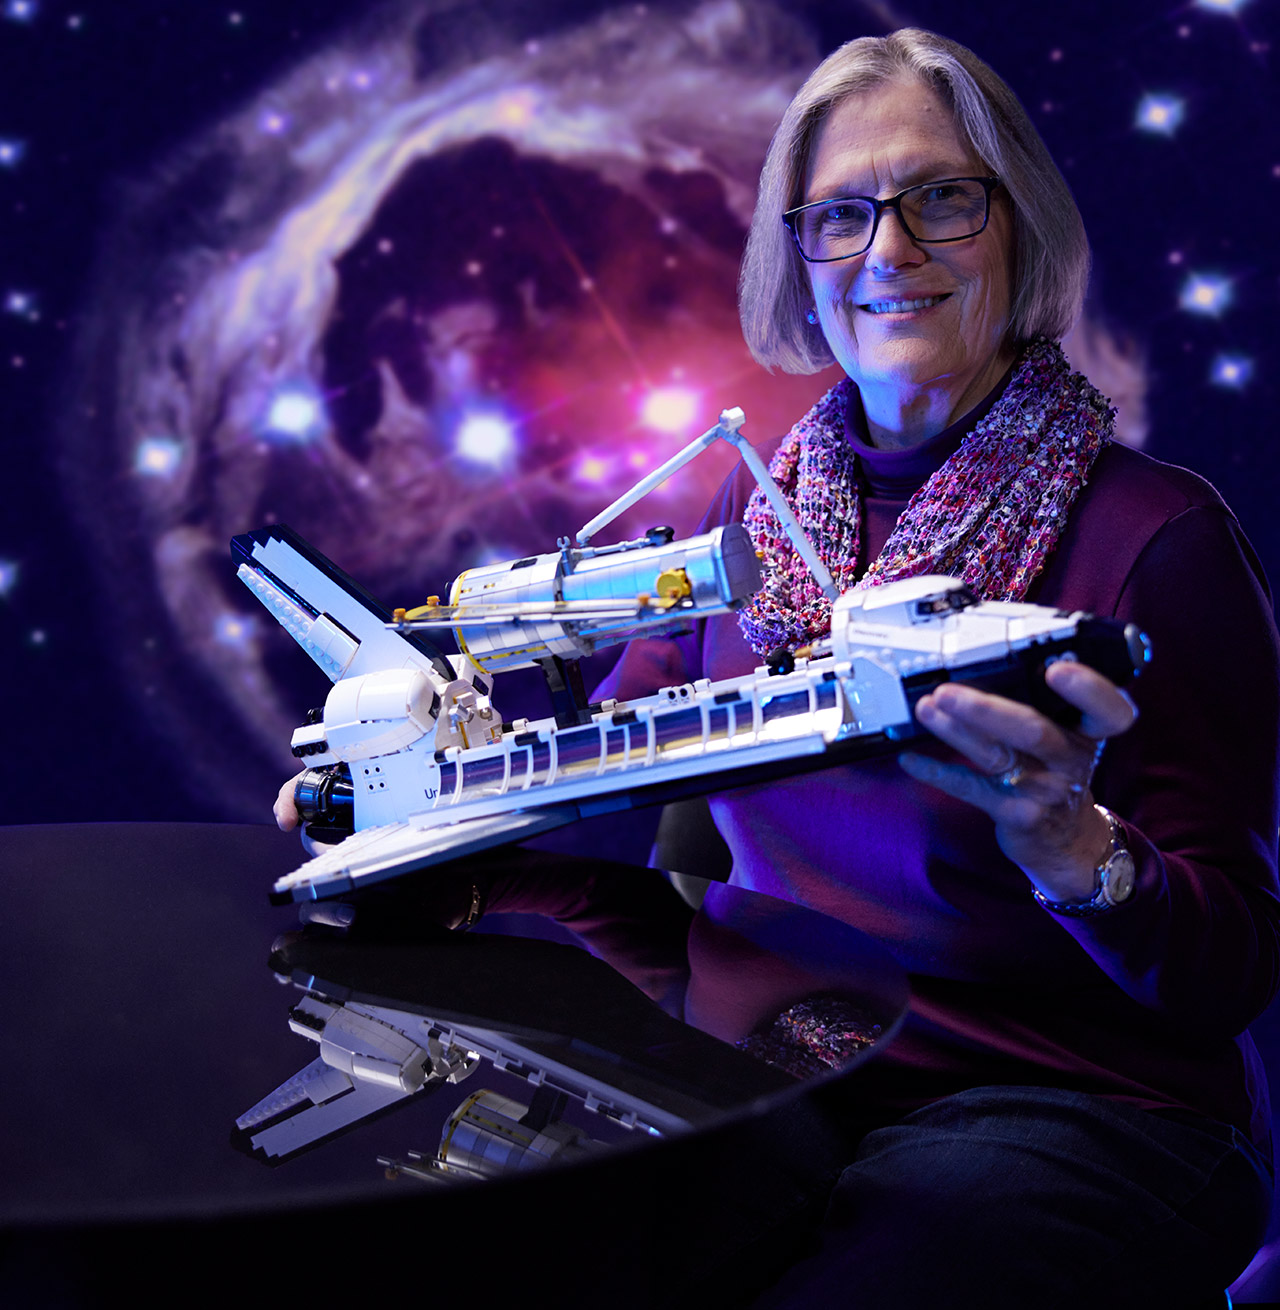 LEGO Astronaut Kathy Sullivan NASA Space Shuttle Discovery